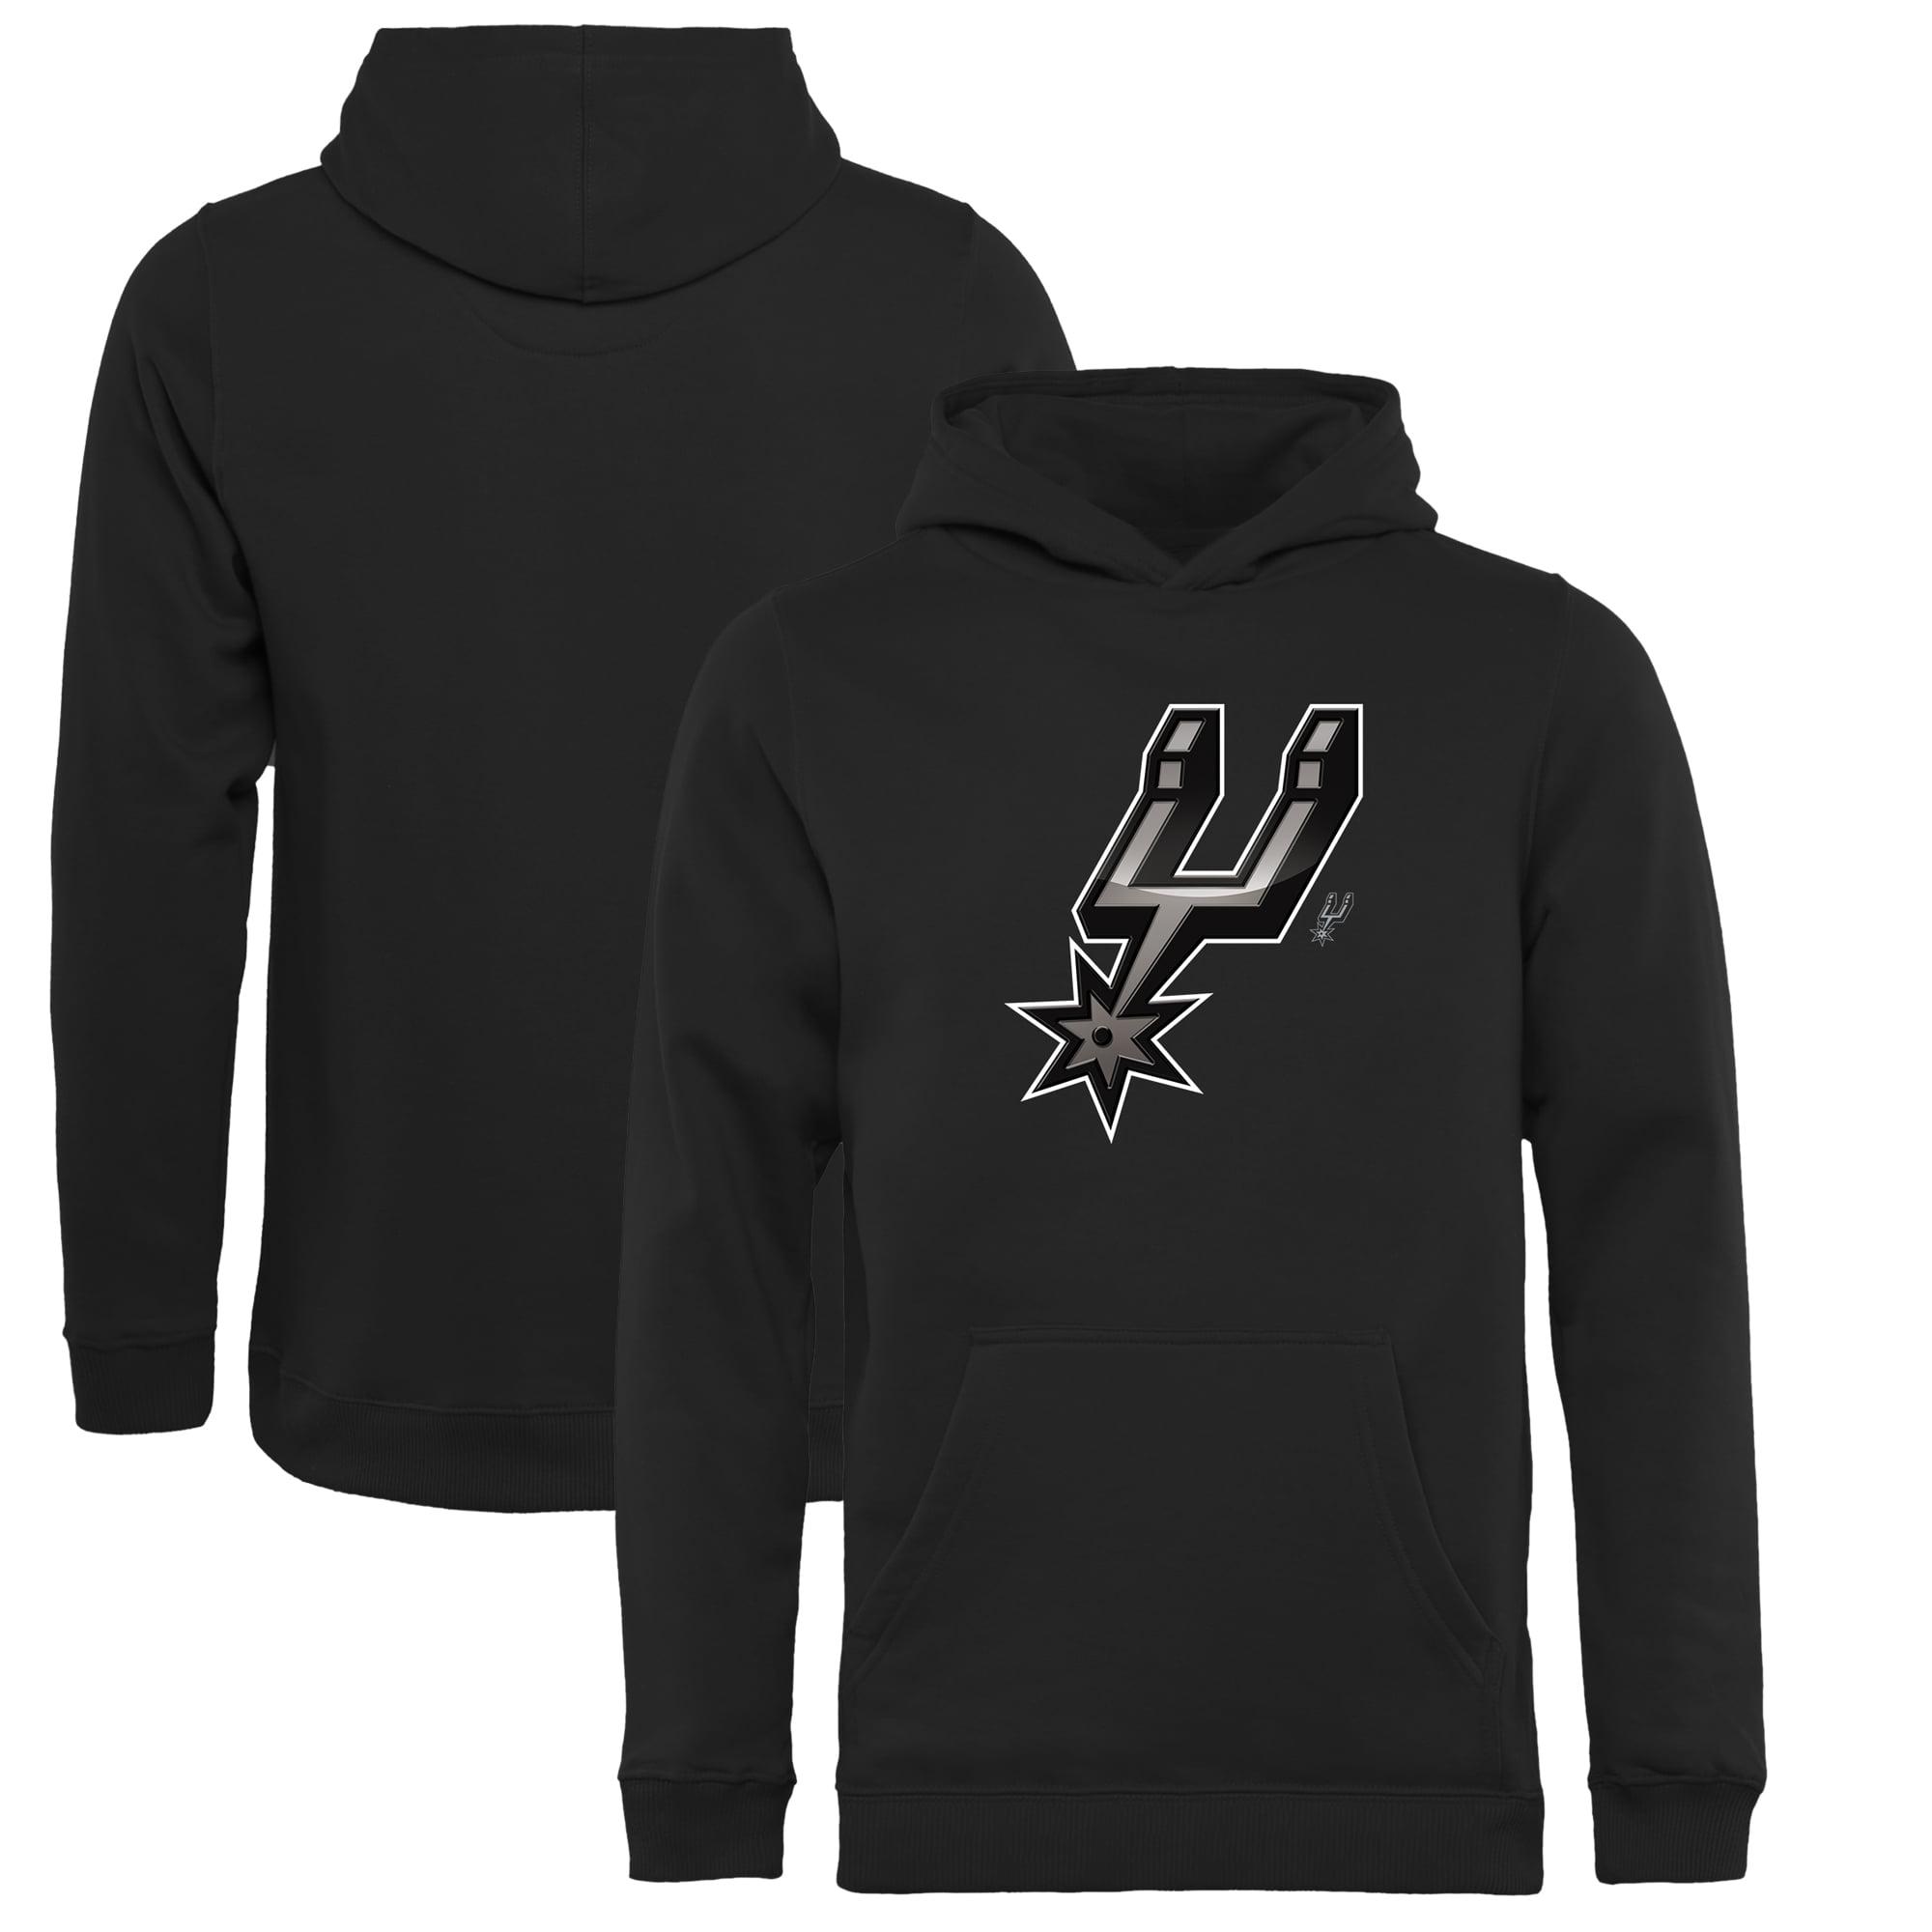 San Antonio Spurs Fanatics Branded Youth Midnight Mascot Pullover Hoodie - Black